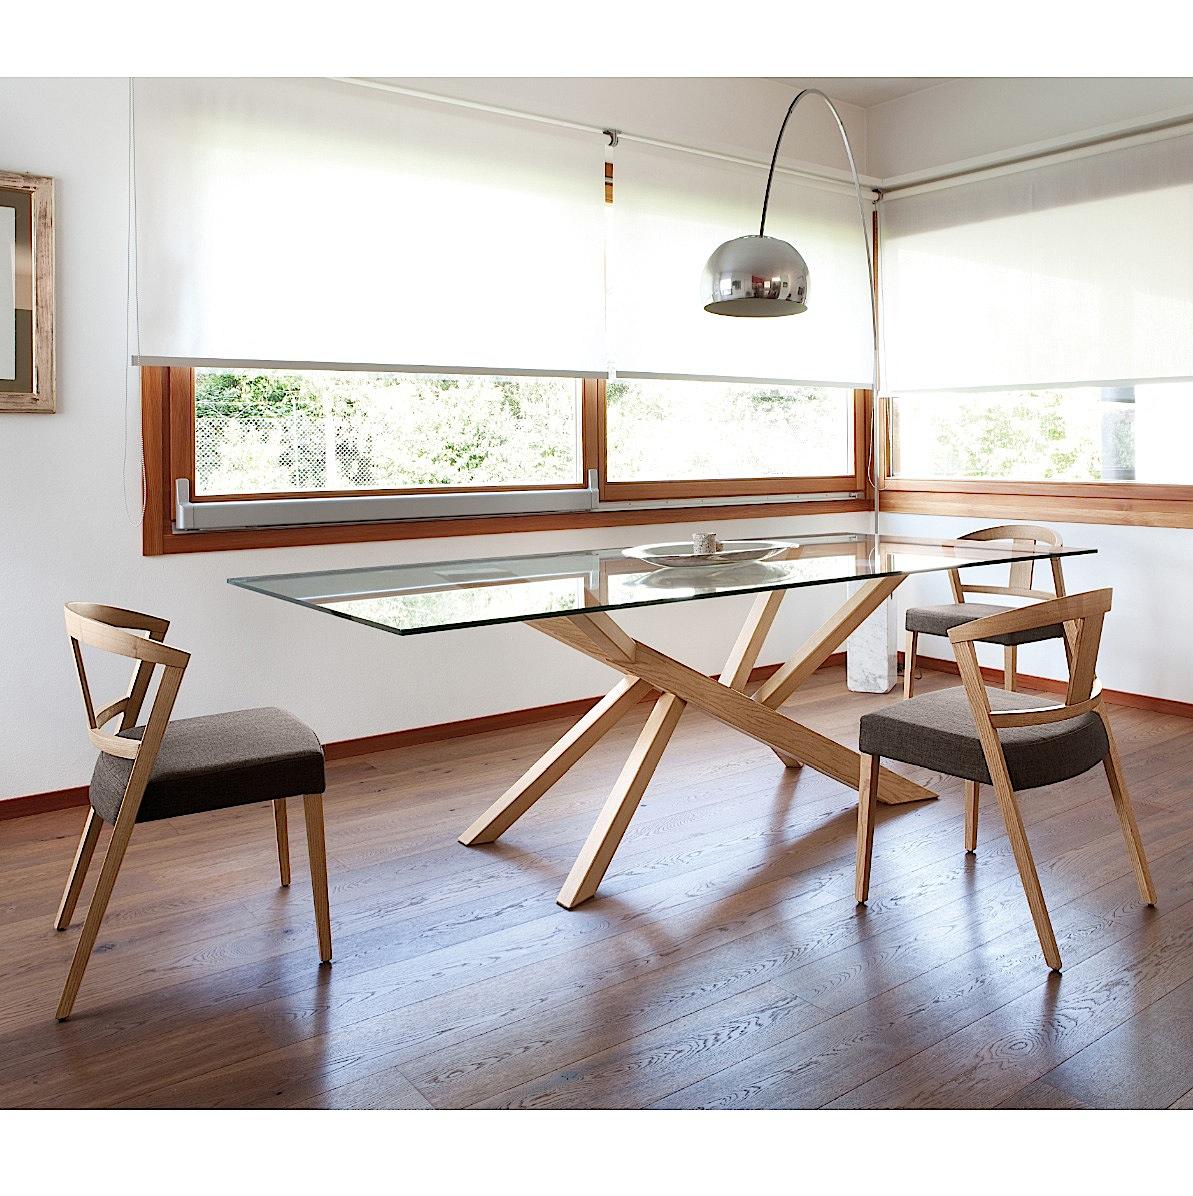 Albero 240 Dining Table-32097